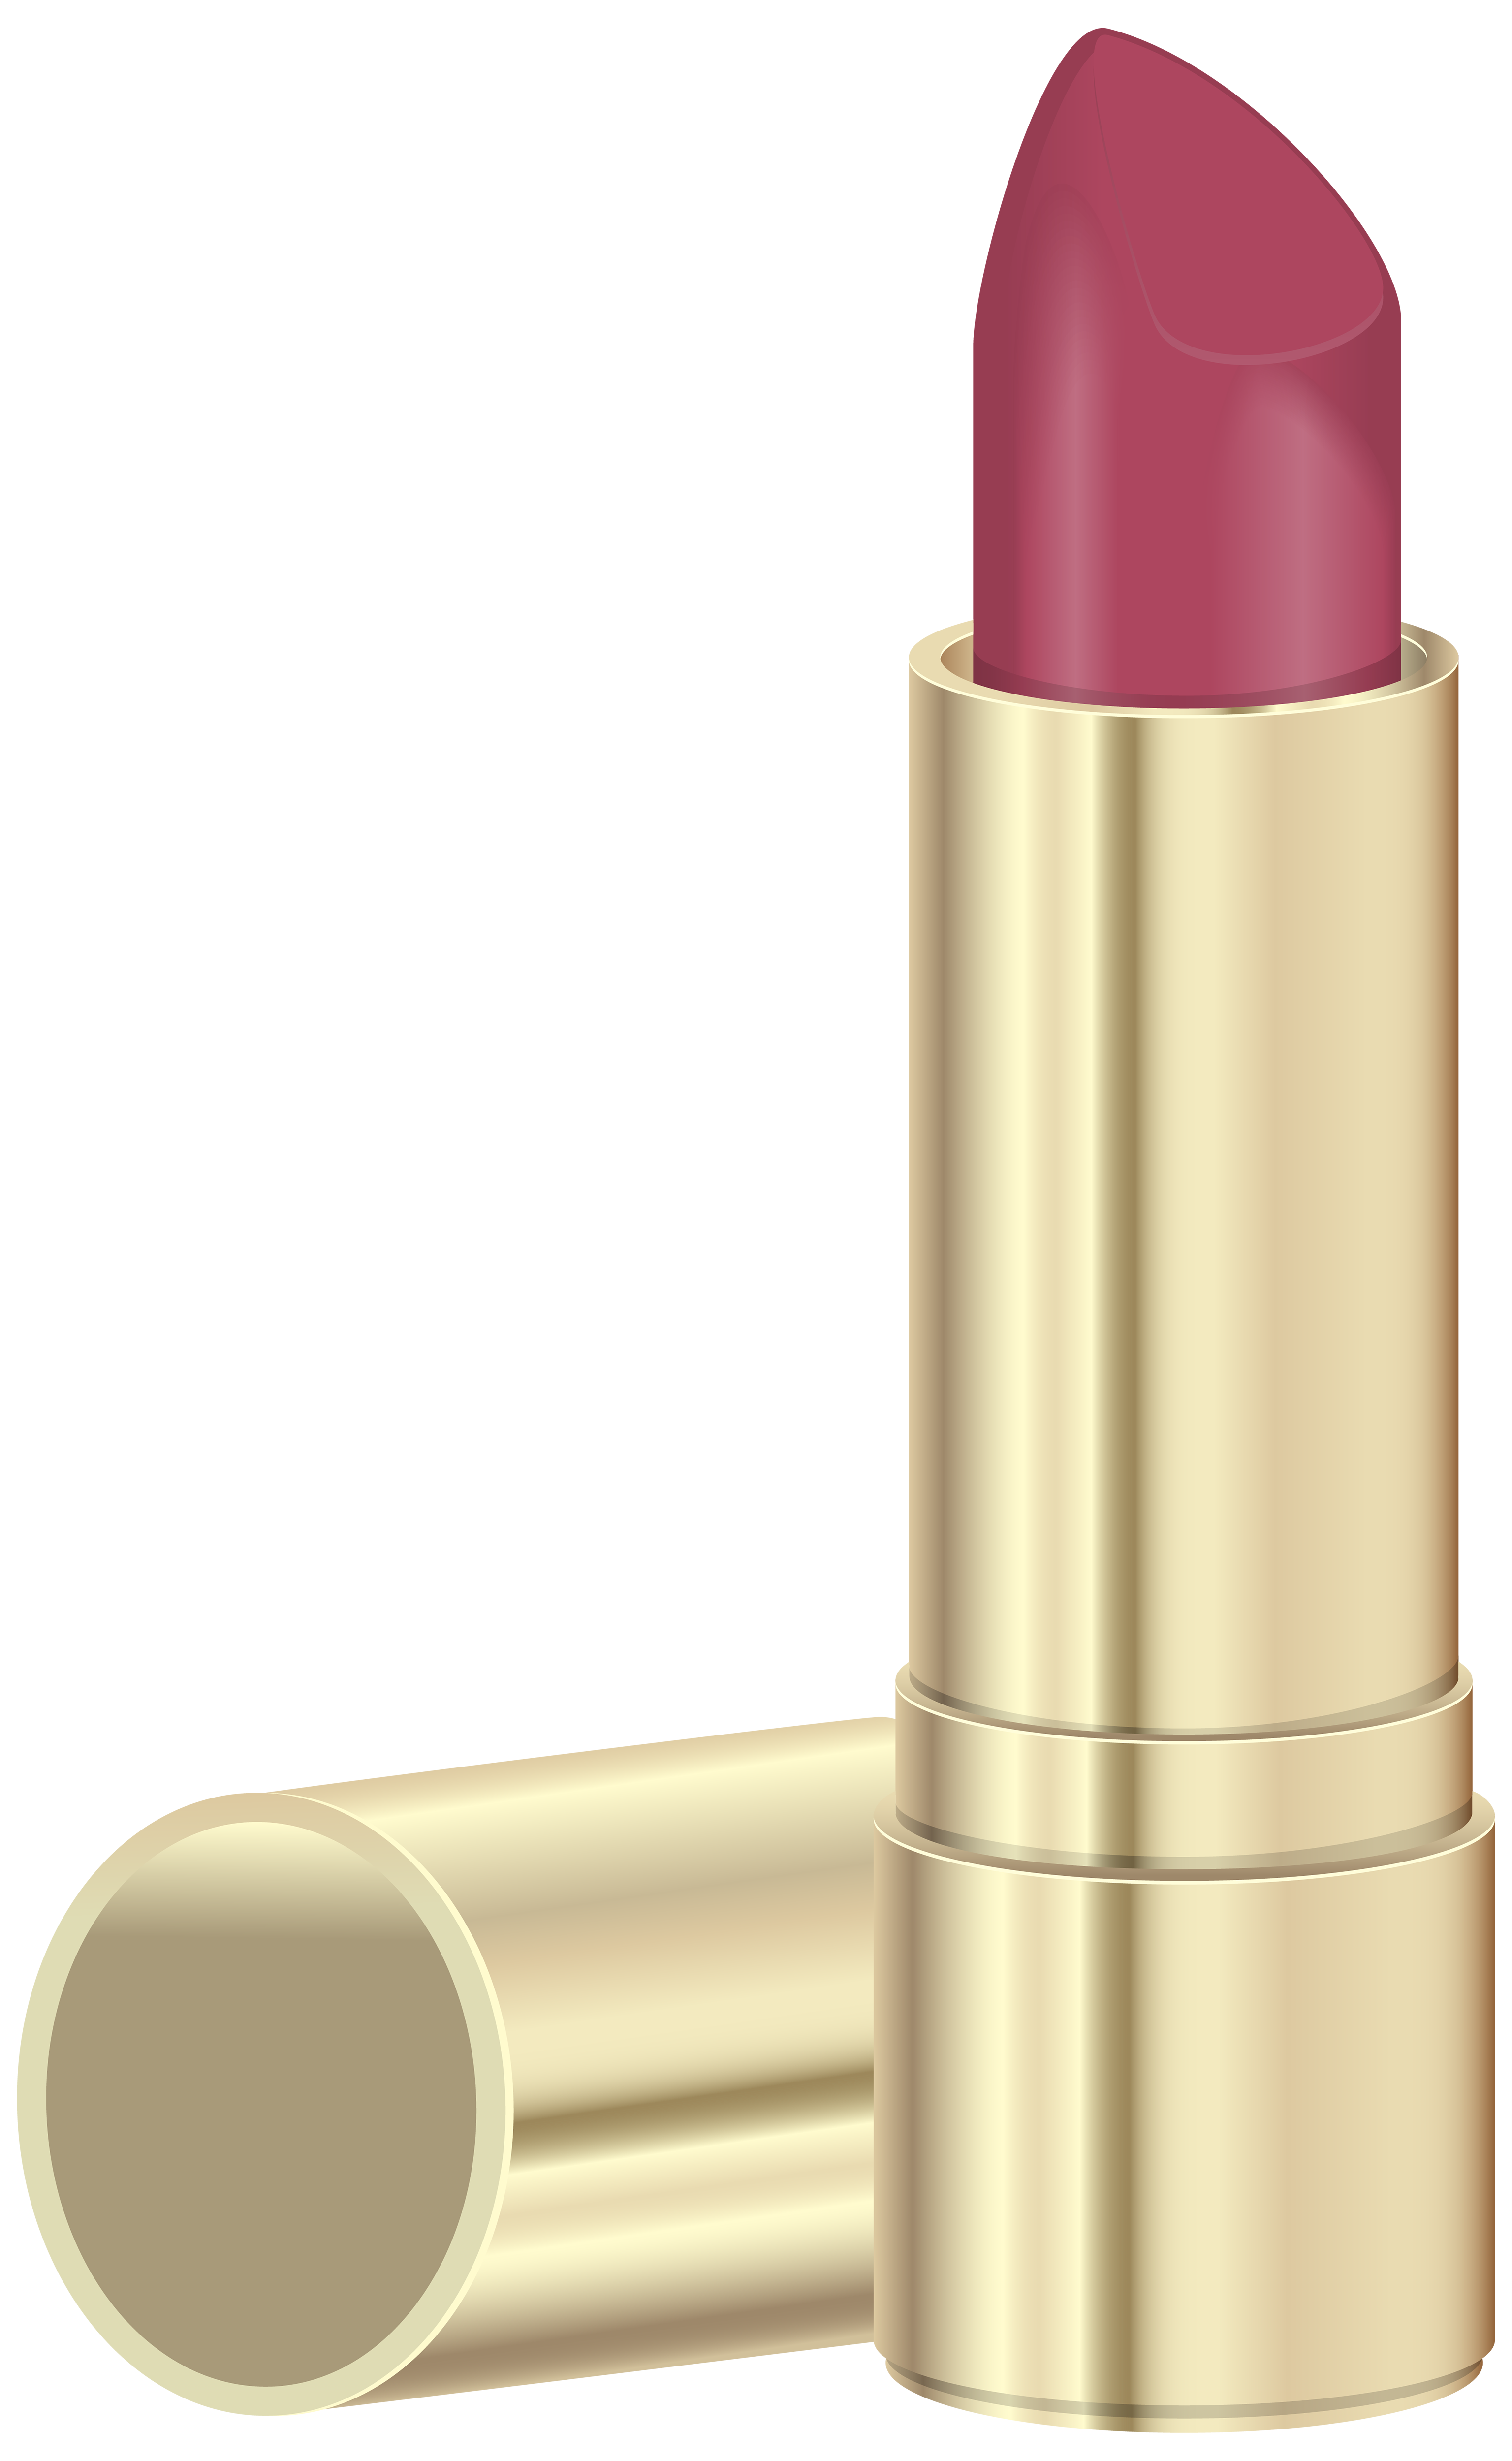 lipstick clipart clipground lipstick clipart outline lipstick clipart png